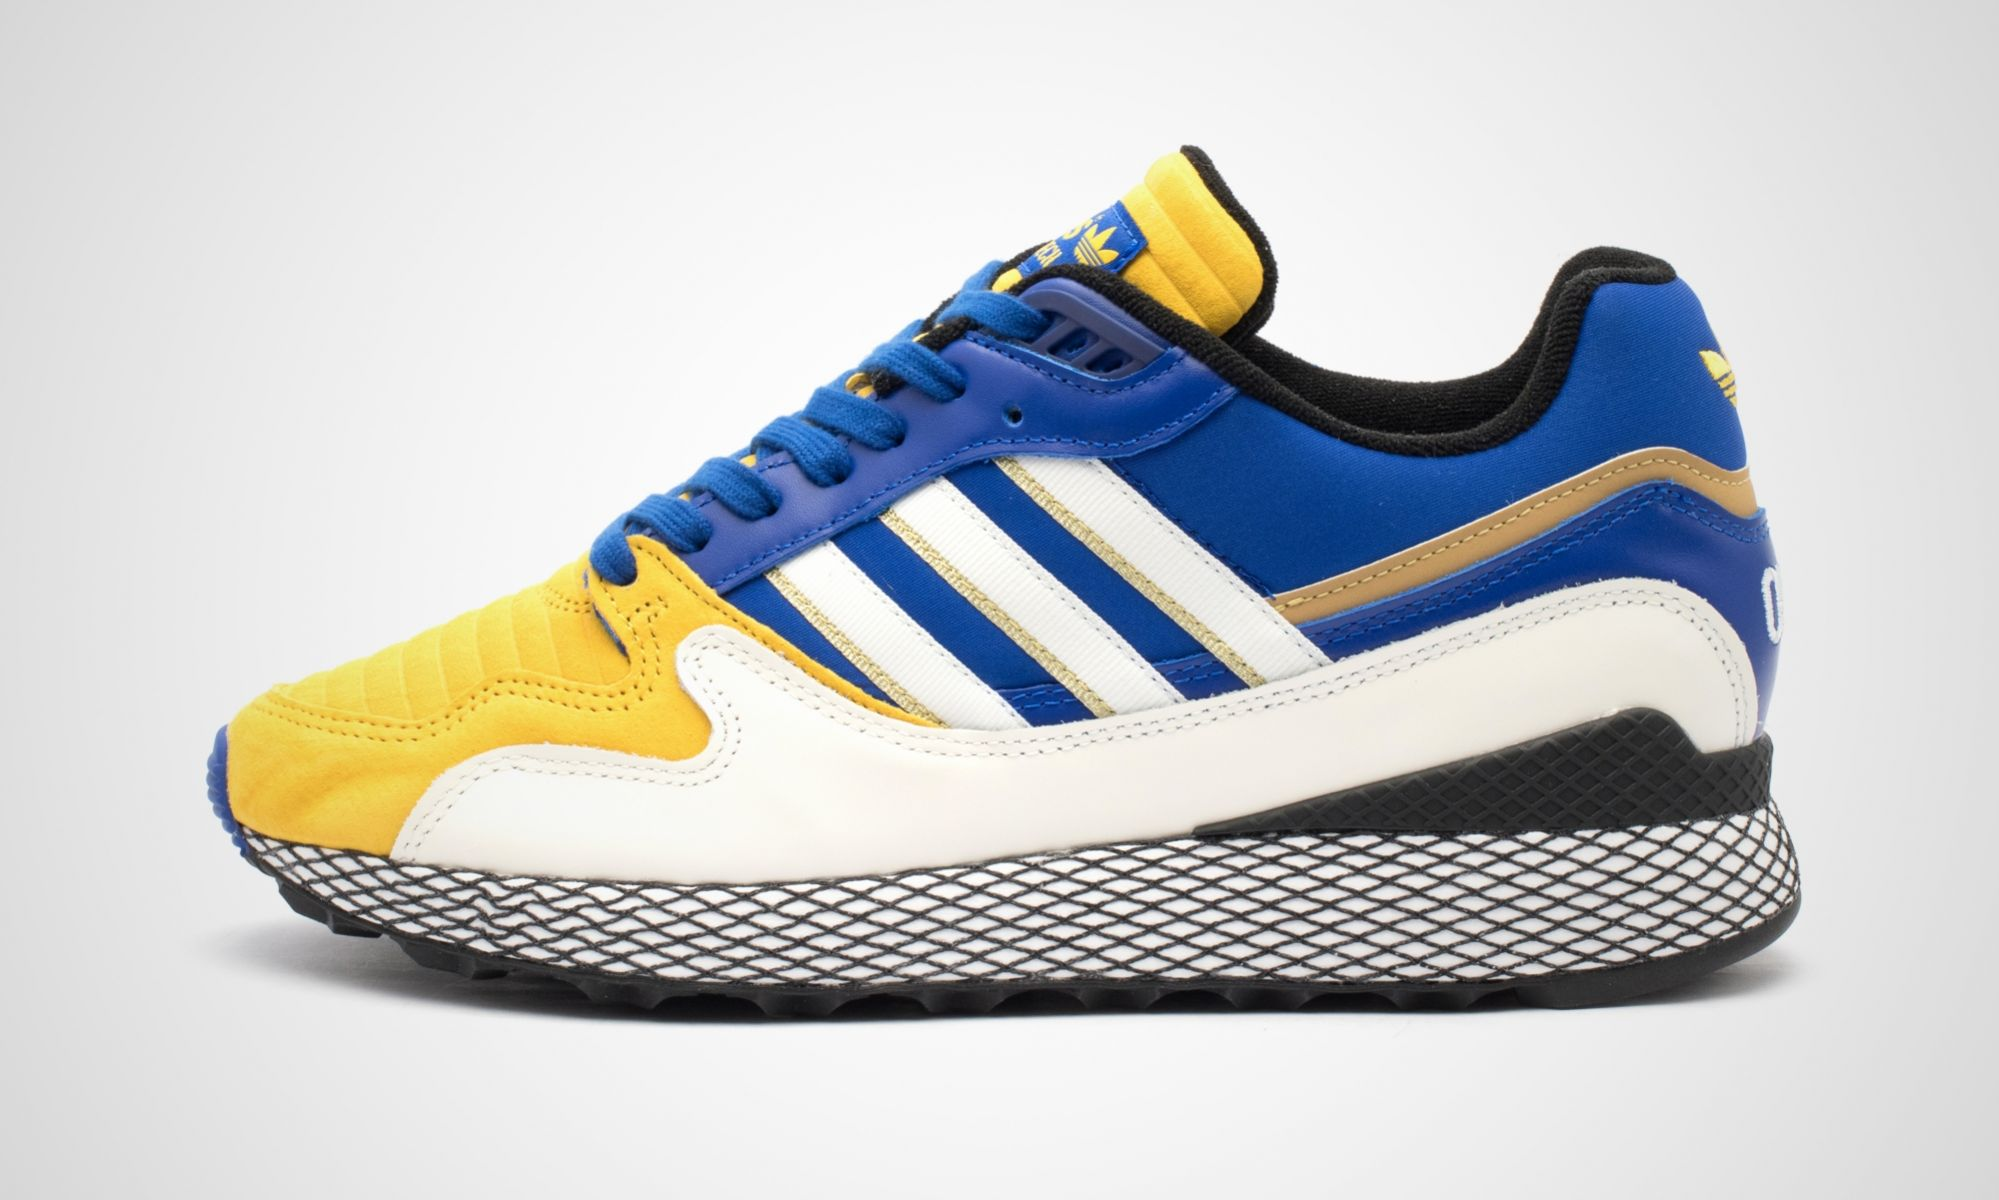 Adidas Ultra Sneakerblog Tech Dragonball Z Stock VegetaDead Pack e29bWHYEID